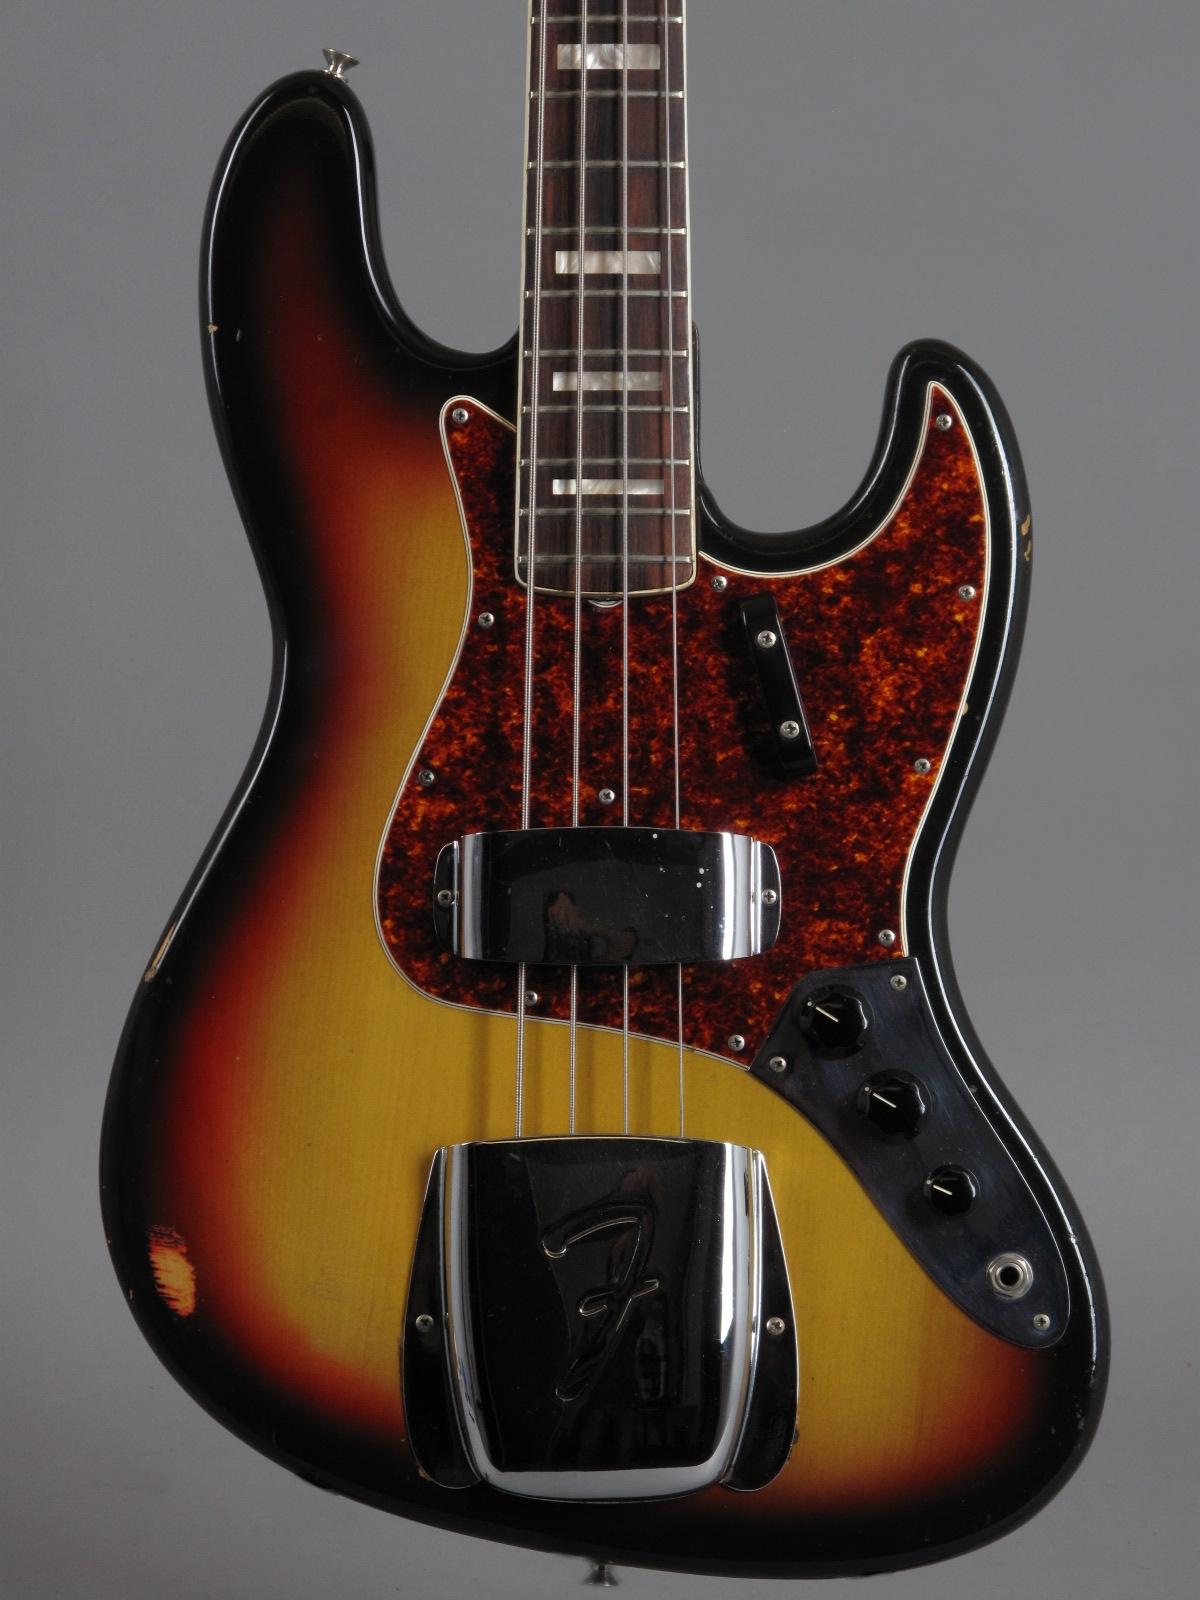 1972 Fender Jazz Bass - 3t-Sunburst